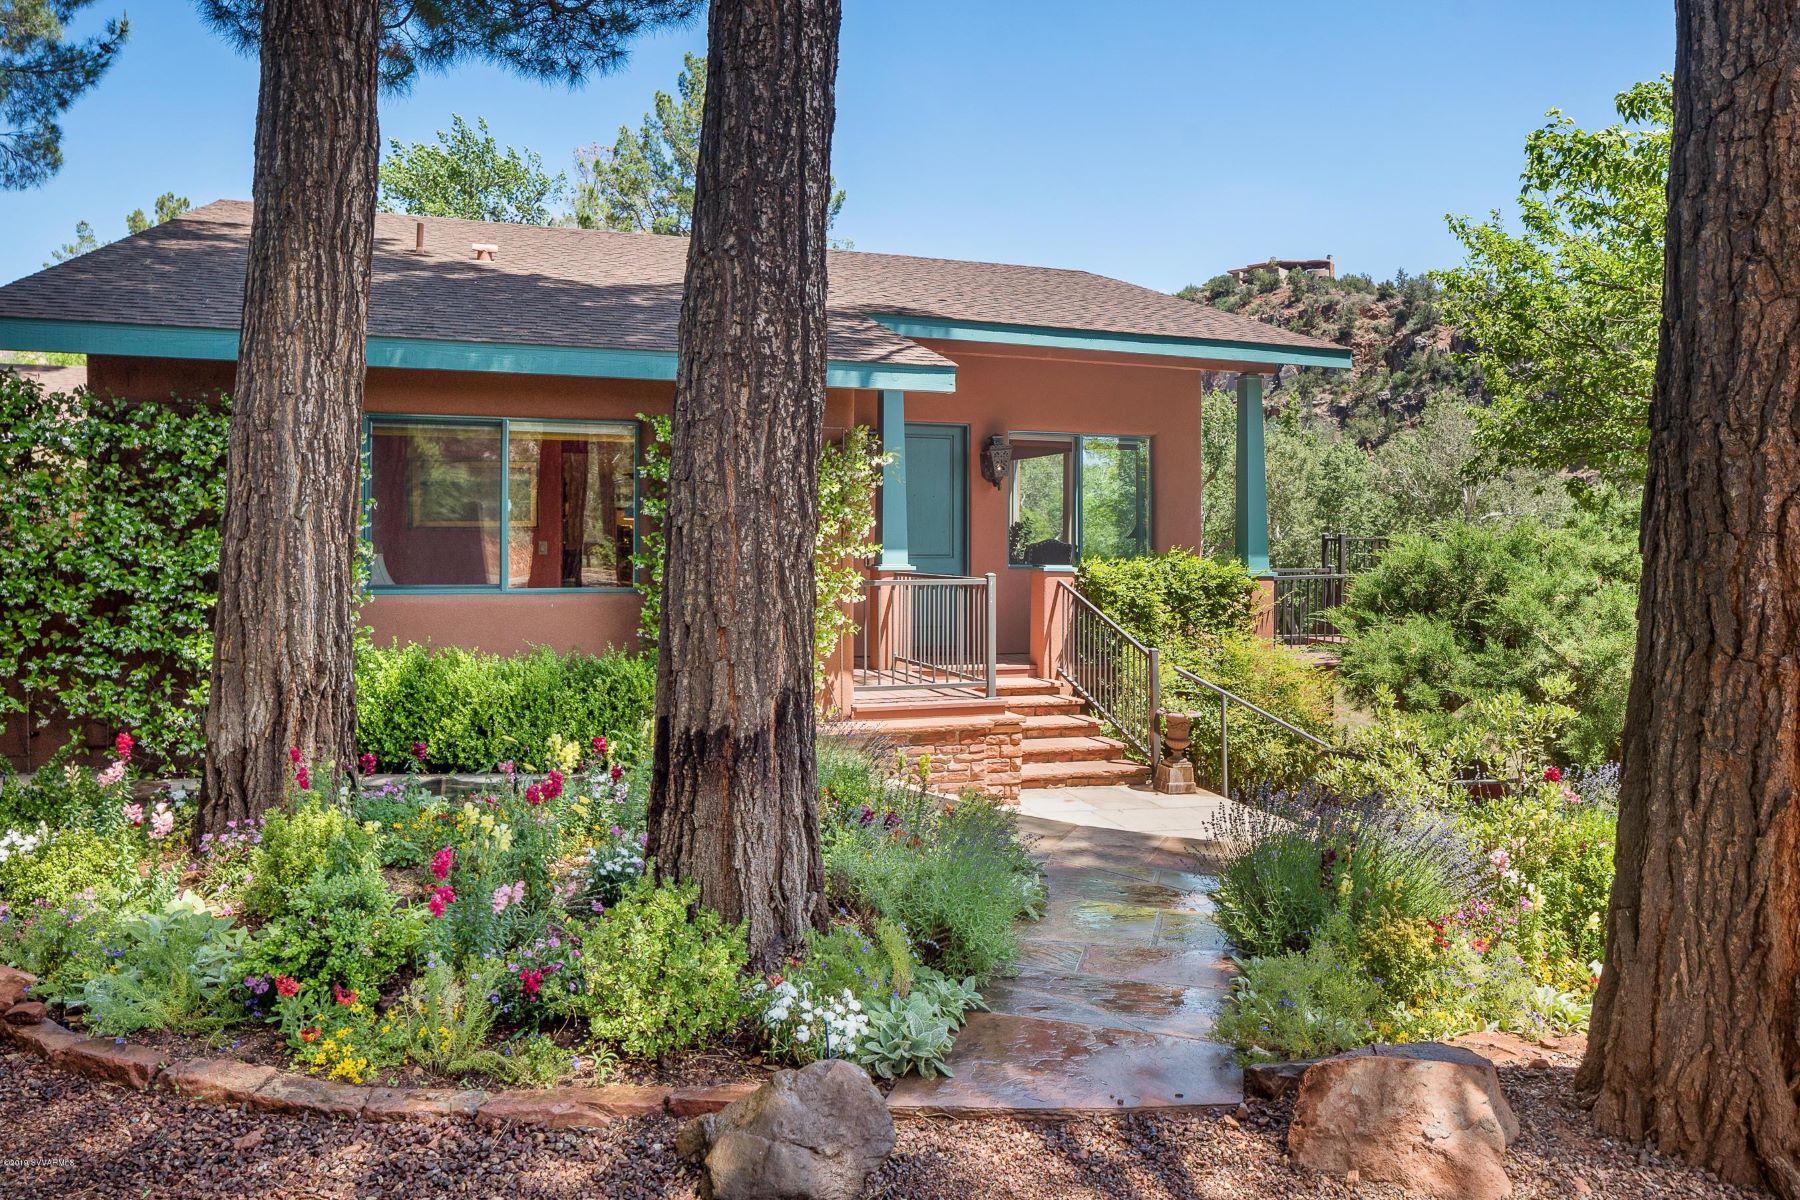 Single Family Homes για την Πώληση στο Creekside Sedona Ranch 1675 Chavez Ranch Rd, Sedona, Αριζονα 86336 Ηνωμένες Πολιτείες